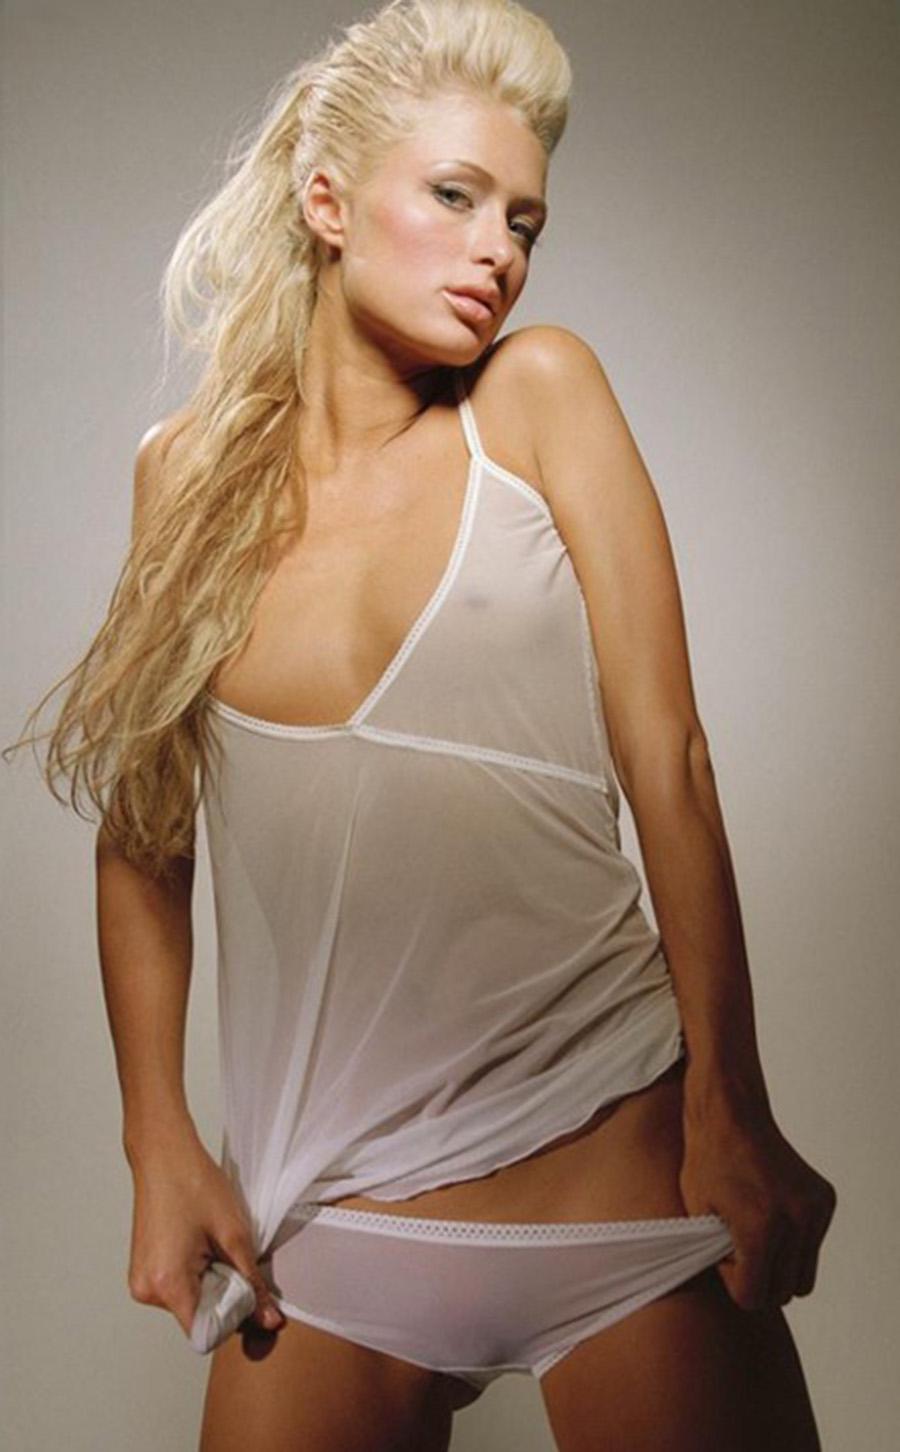 Miley Cyrus Eyebrows Paris Hilton Sex Tape  More-2794